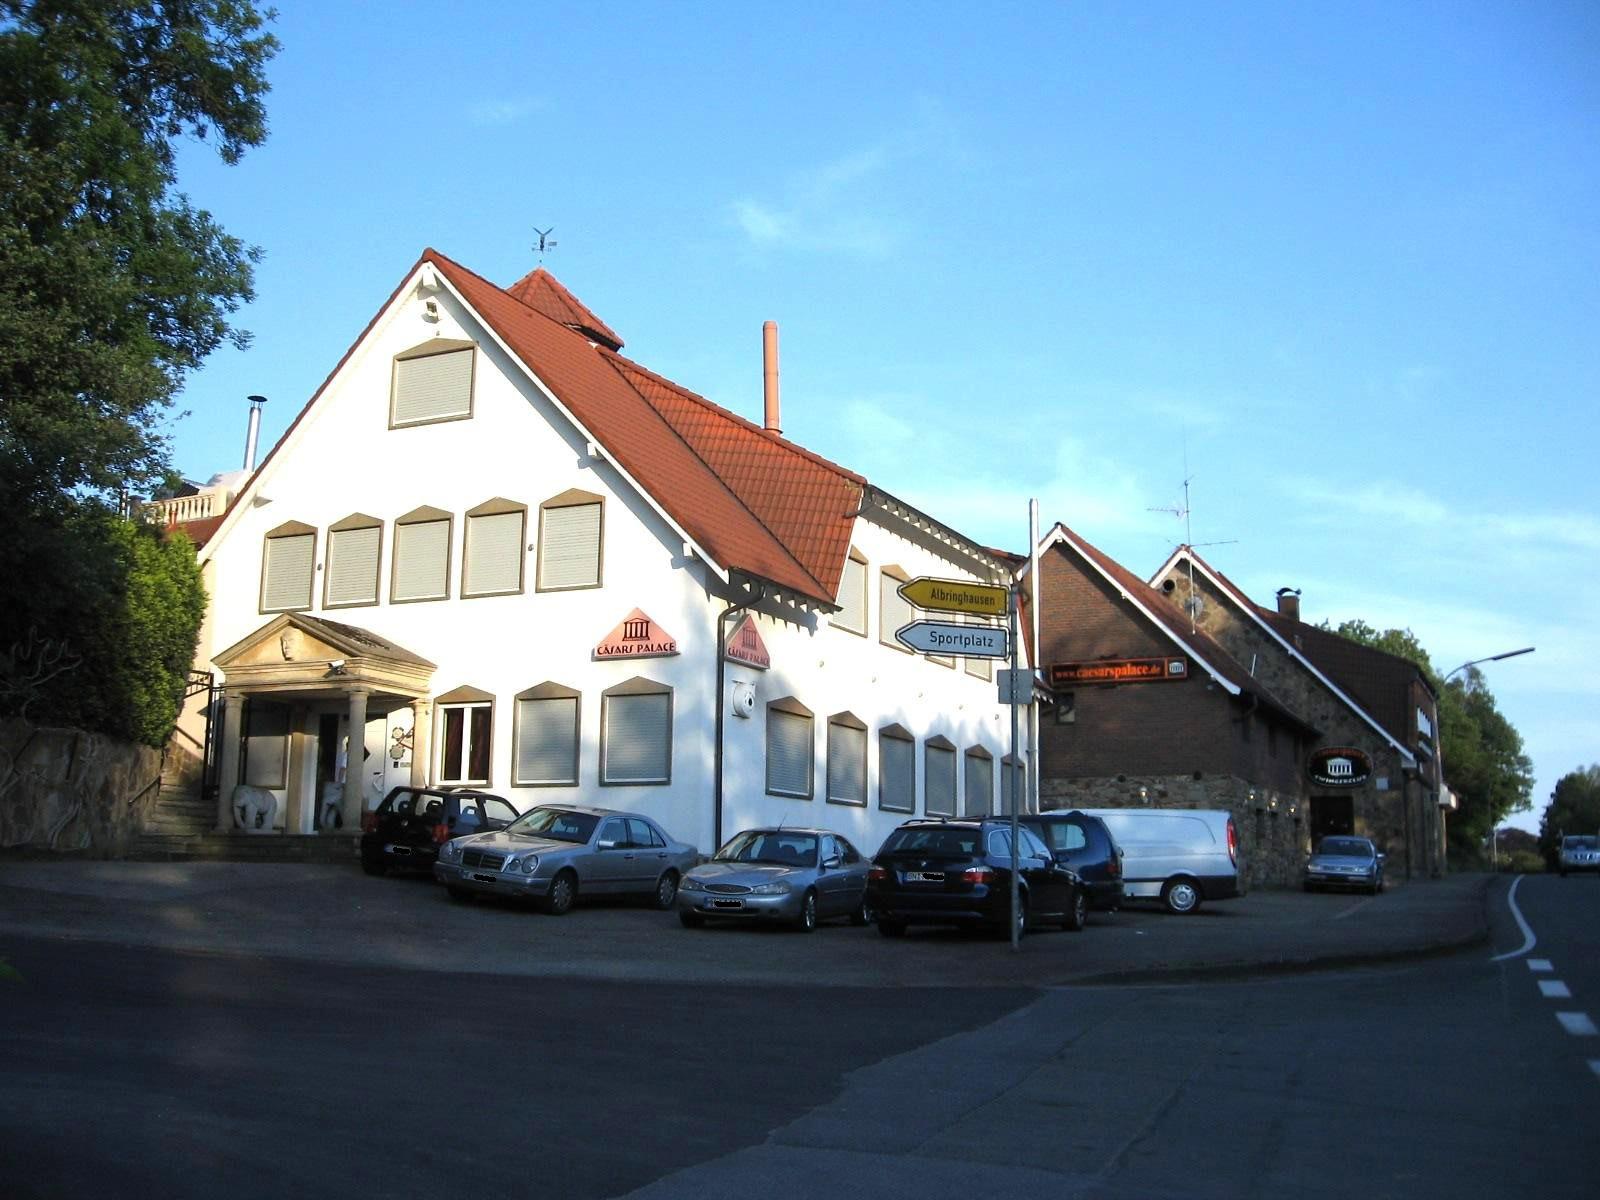 File:Swingerclub Cäsars Palace. Spröckhövel.JPG